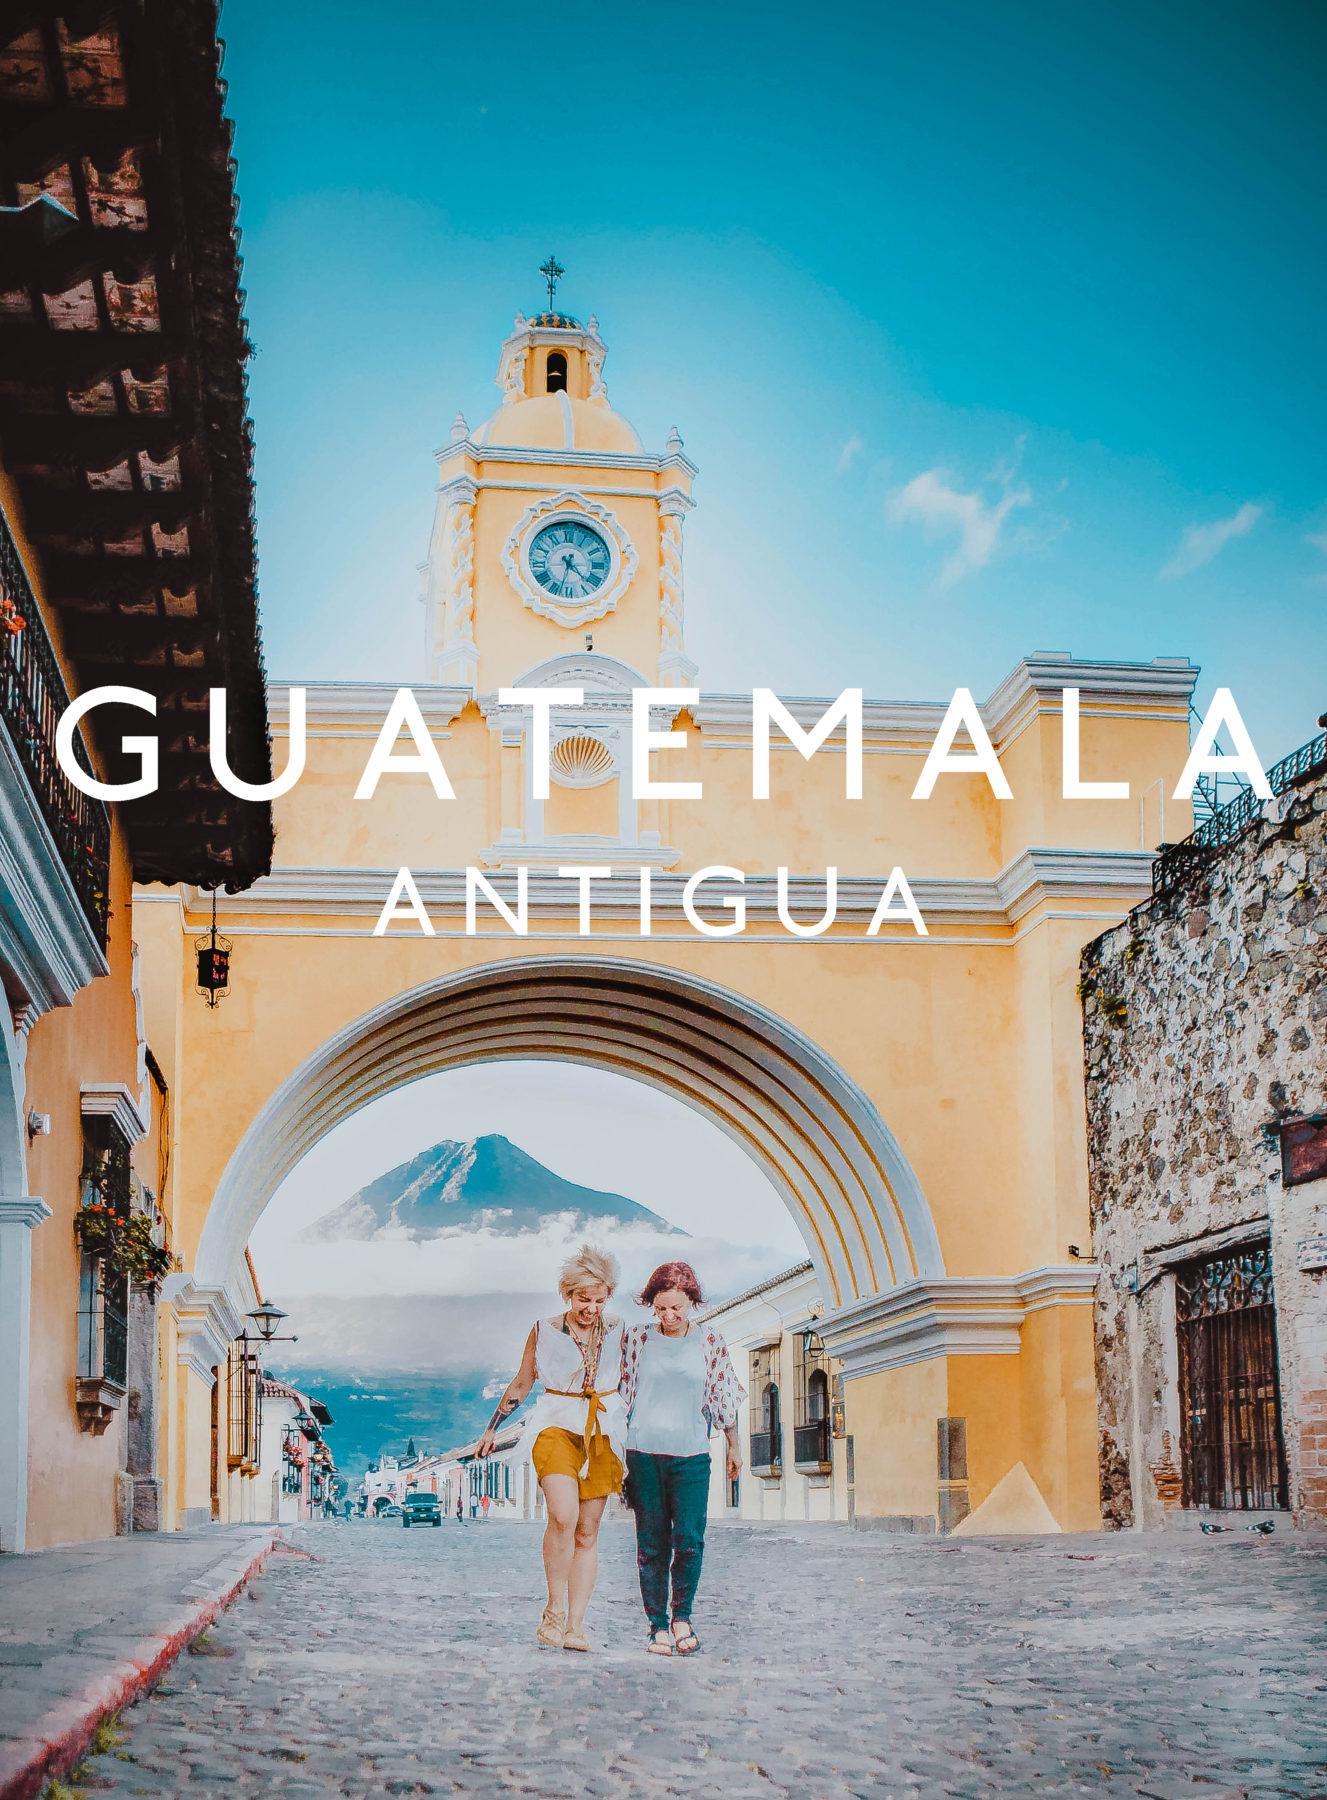 guatemala antigua colonian town exploring central america